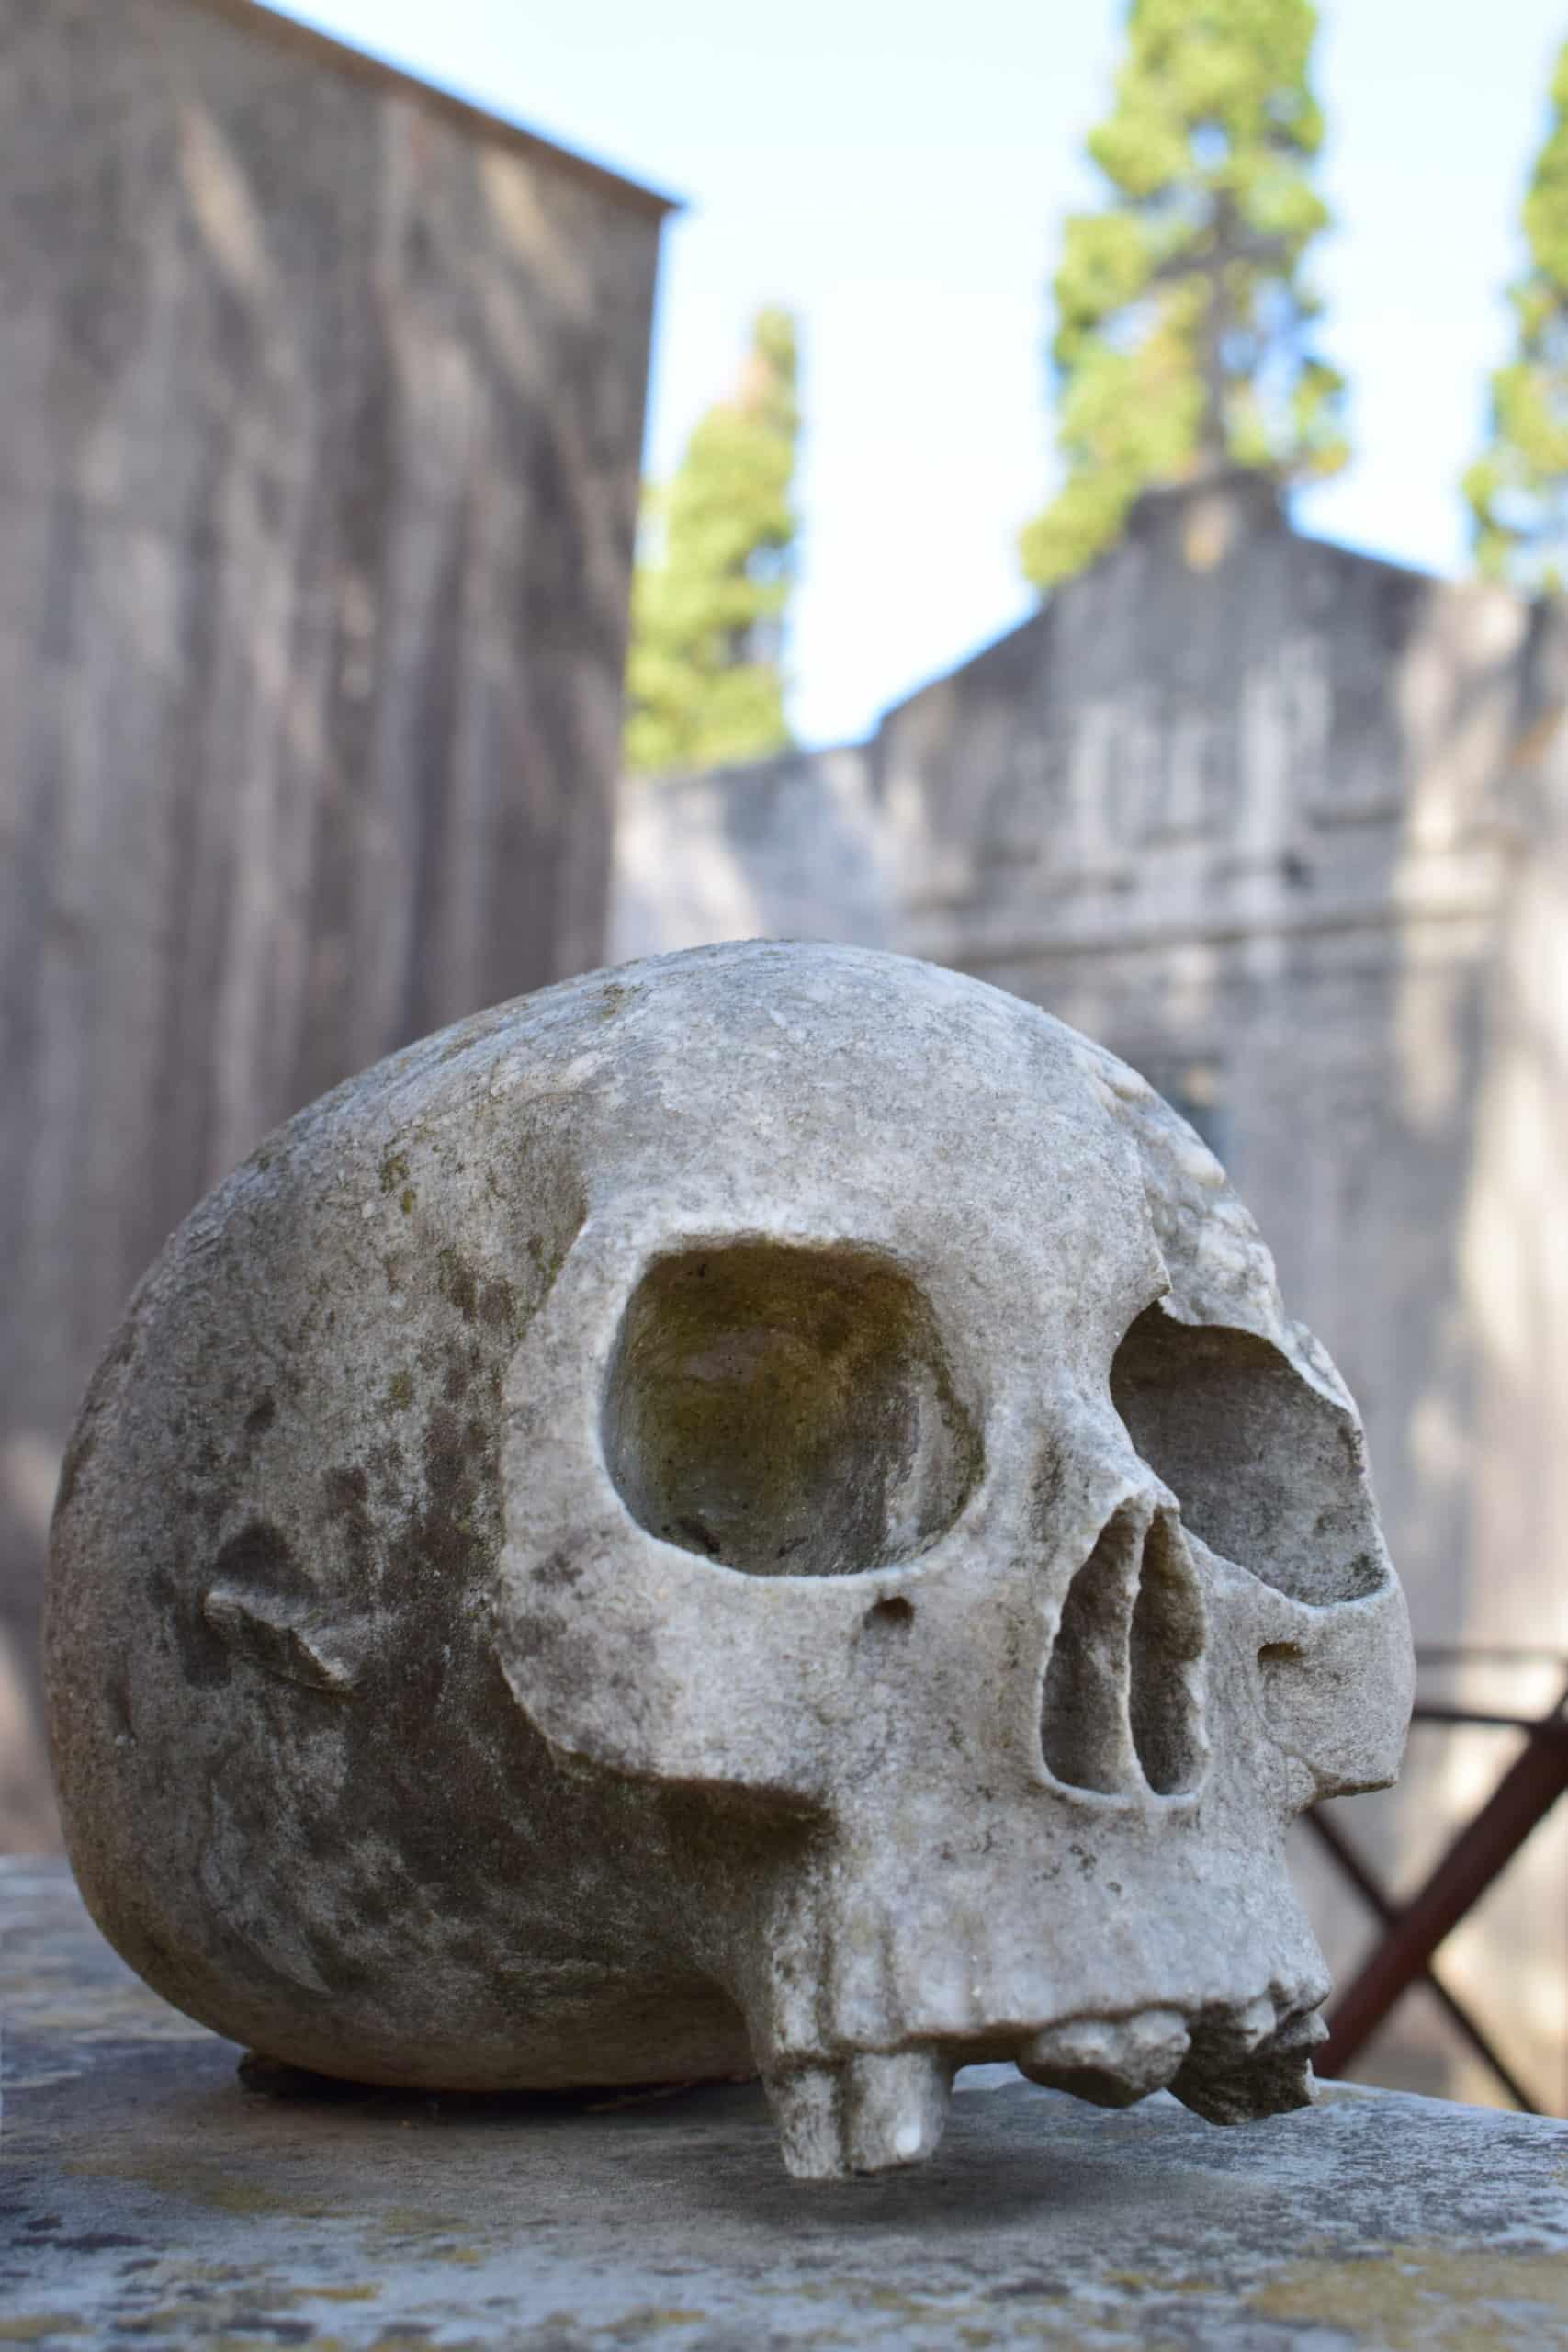 Cemetery Prazeres 7